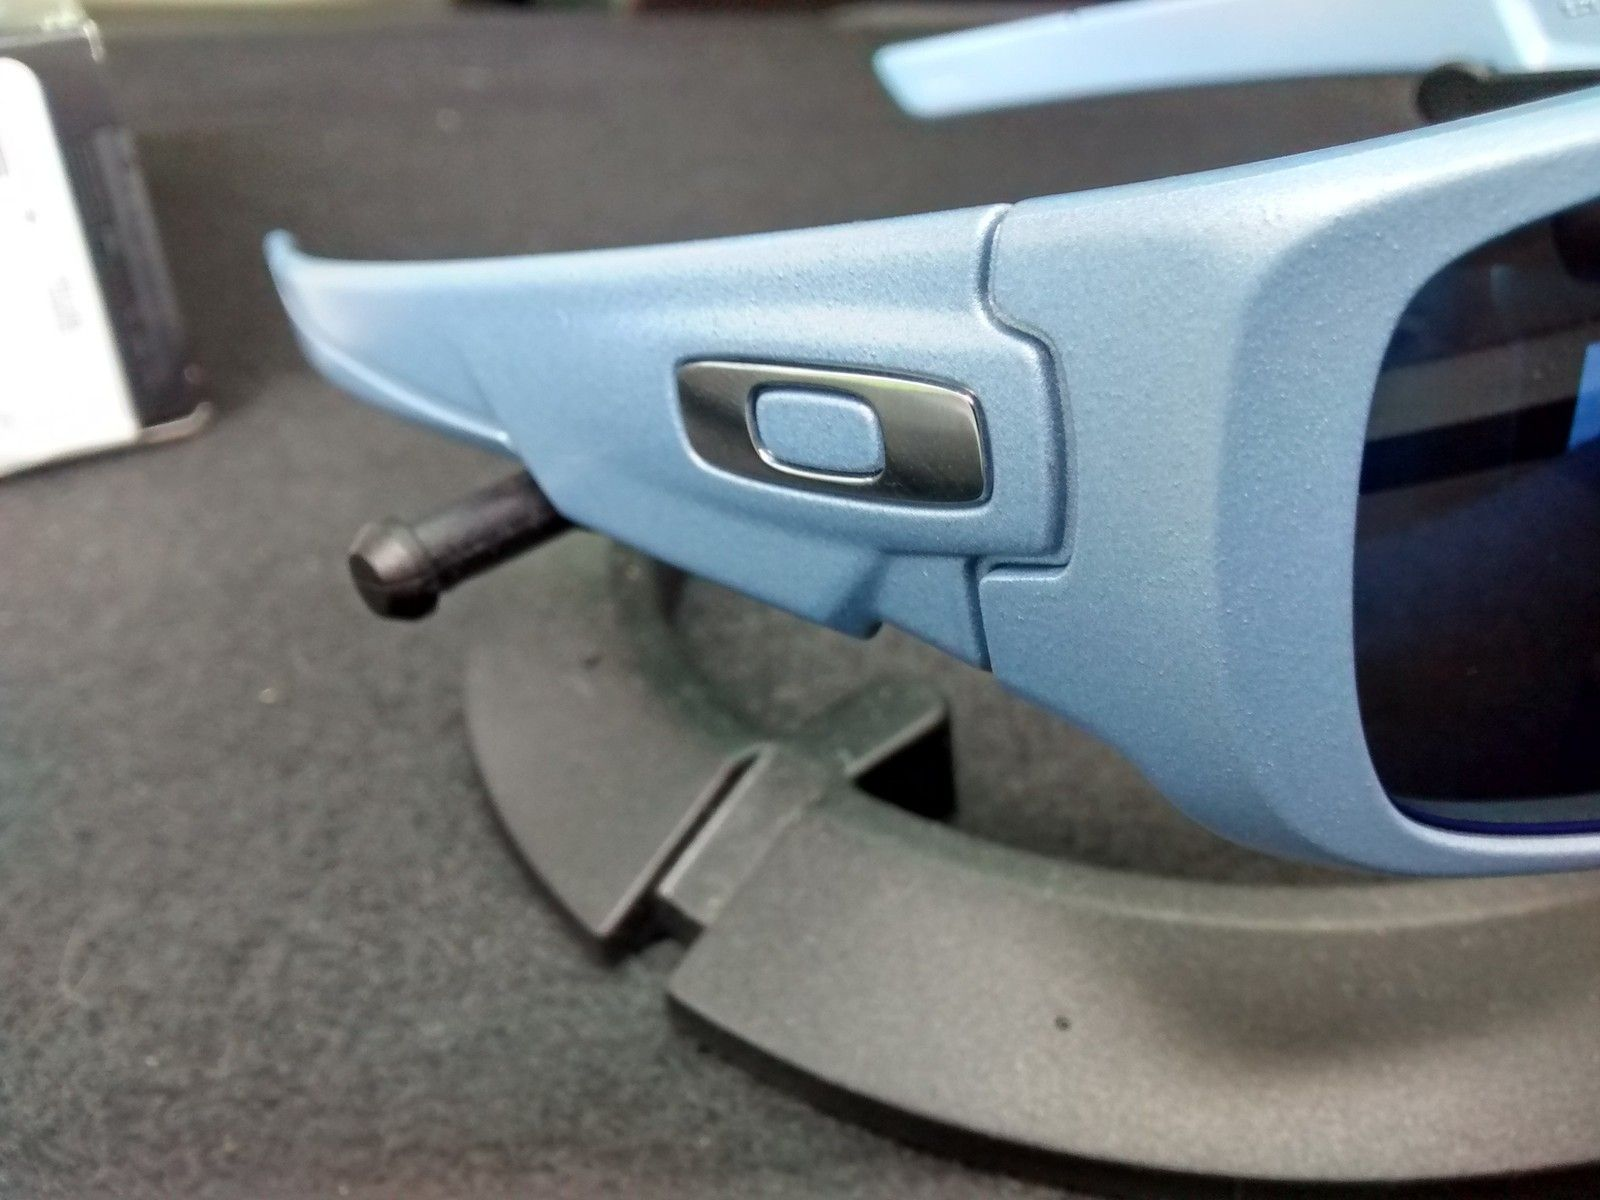 Cool As Ice! Custom Light Blue Metalic Cerakote Crankshaft - QmSPDmn.jpg